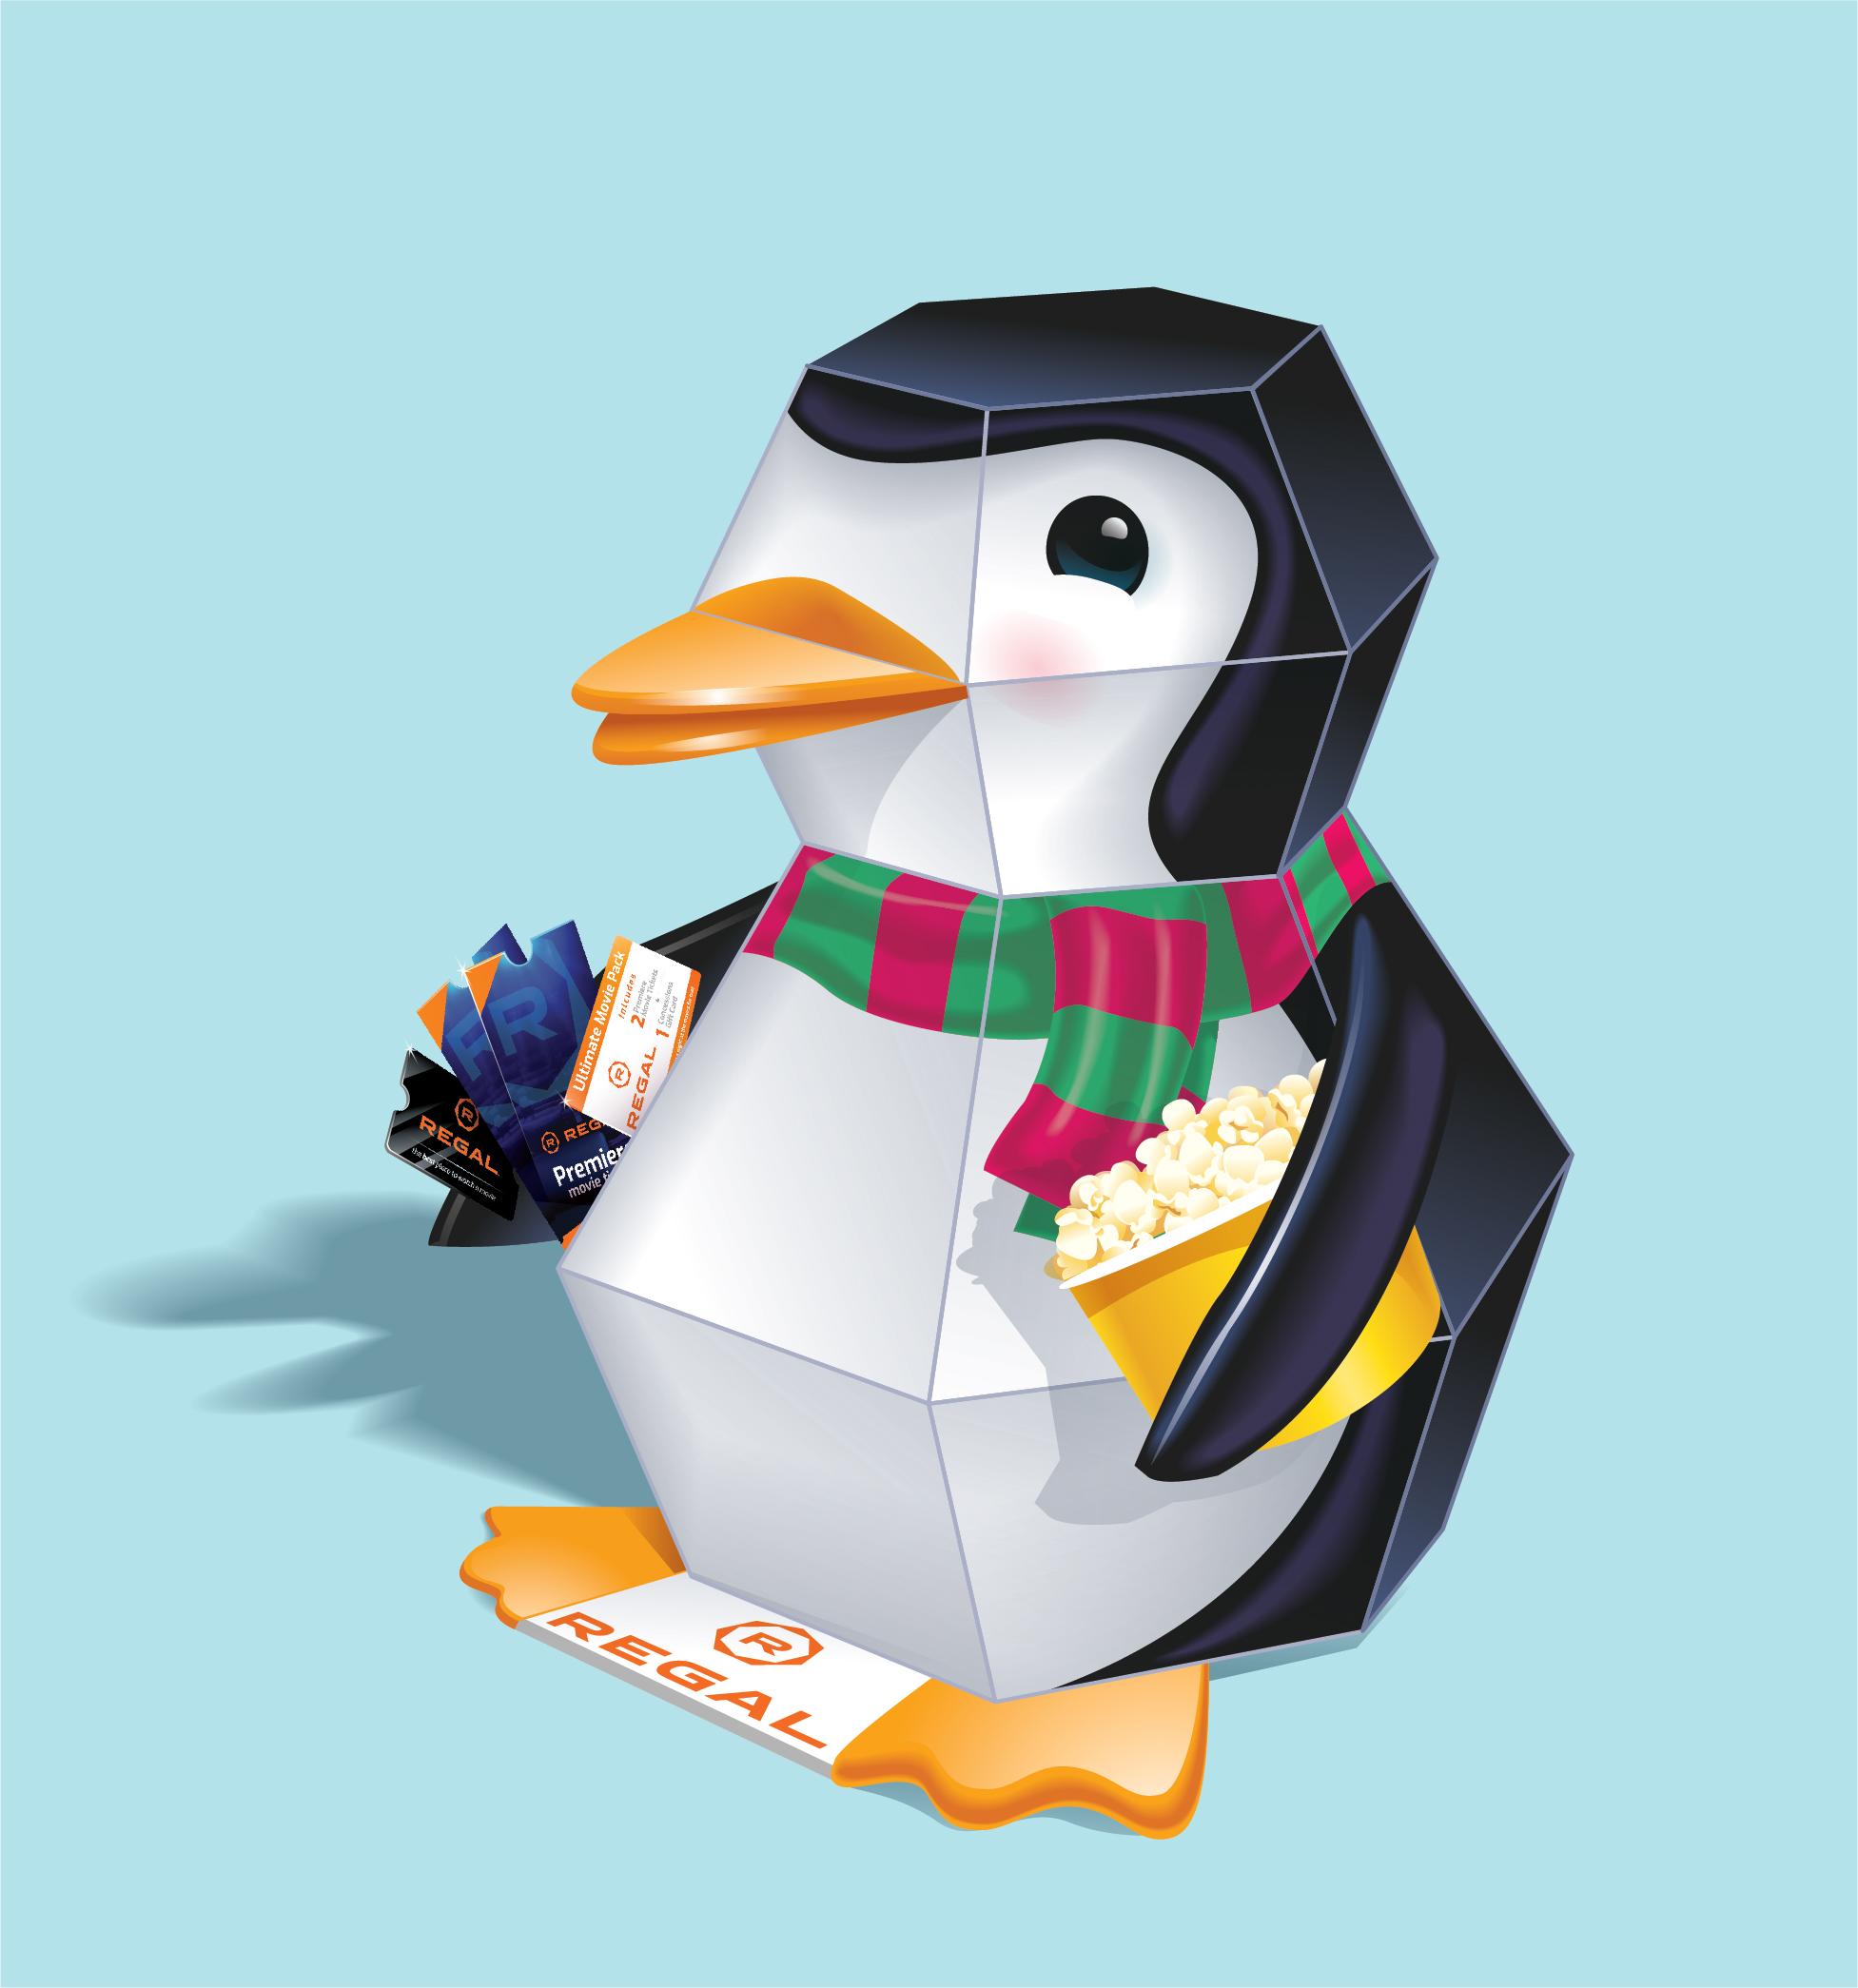 Regal Cinema pop-up penguin